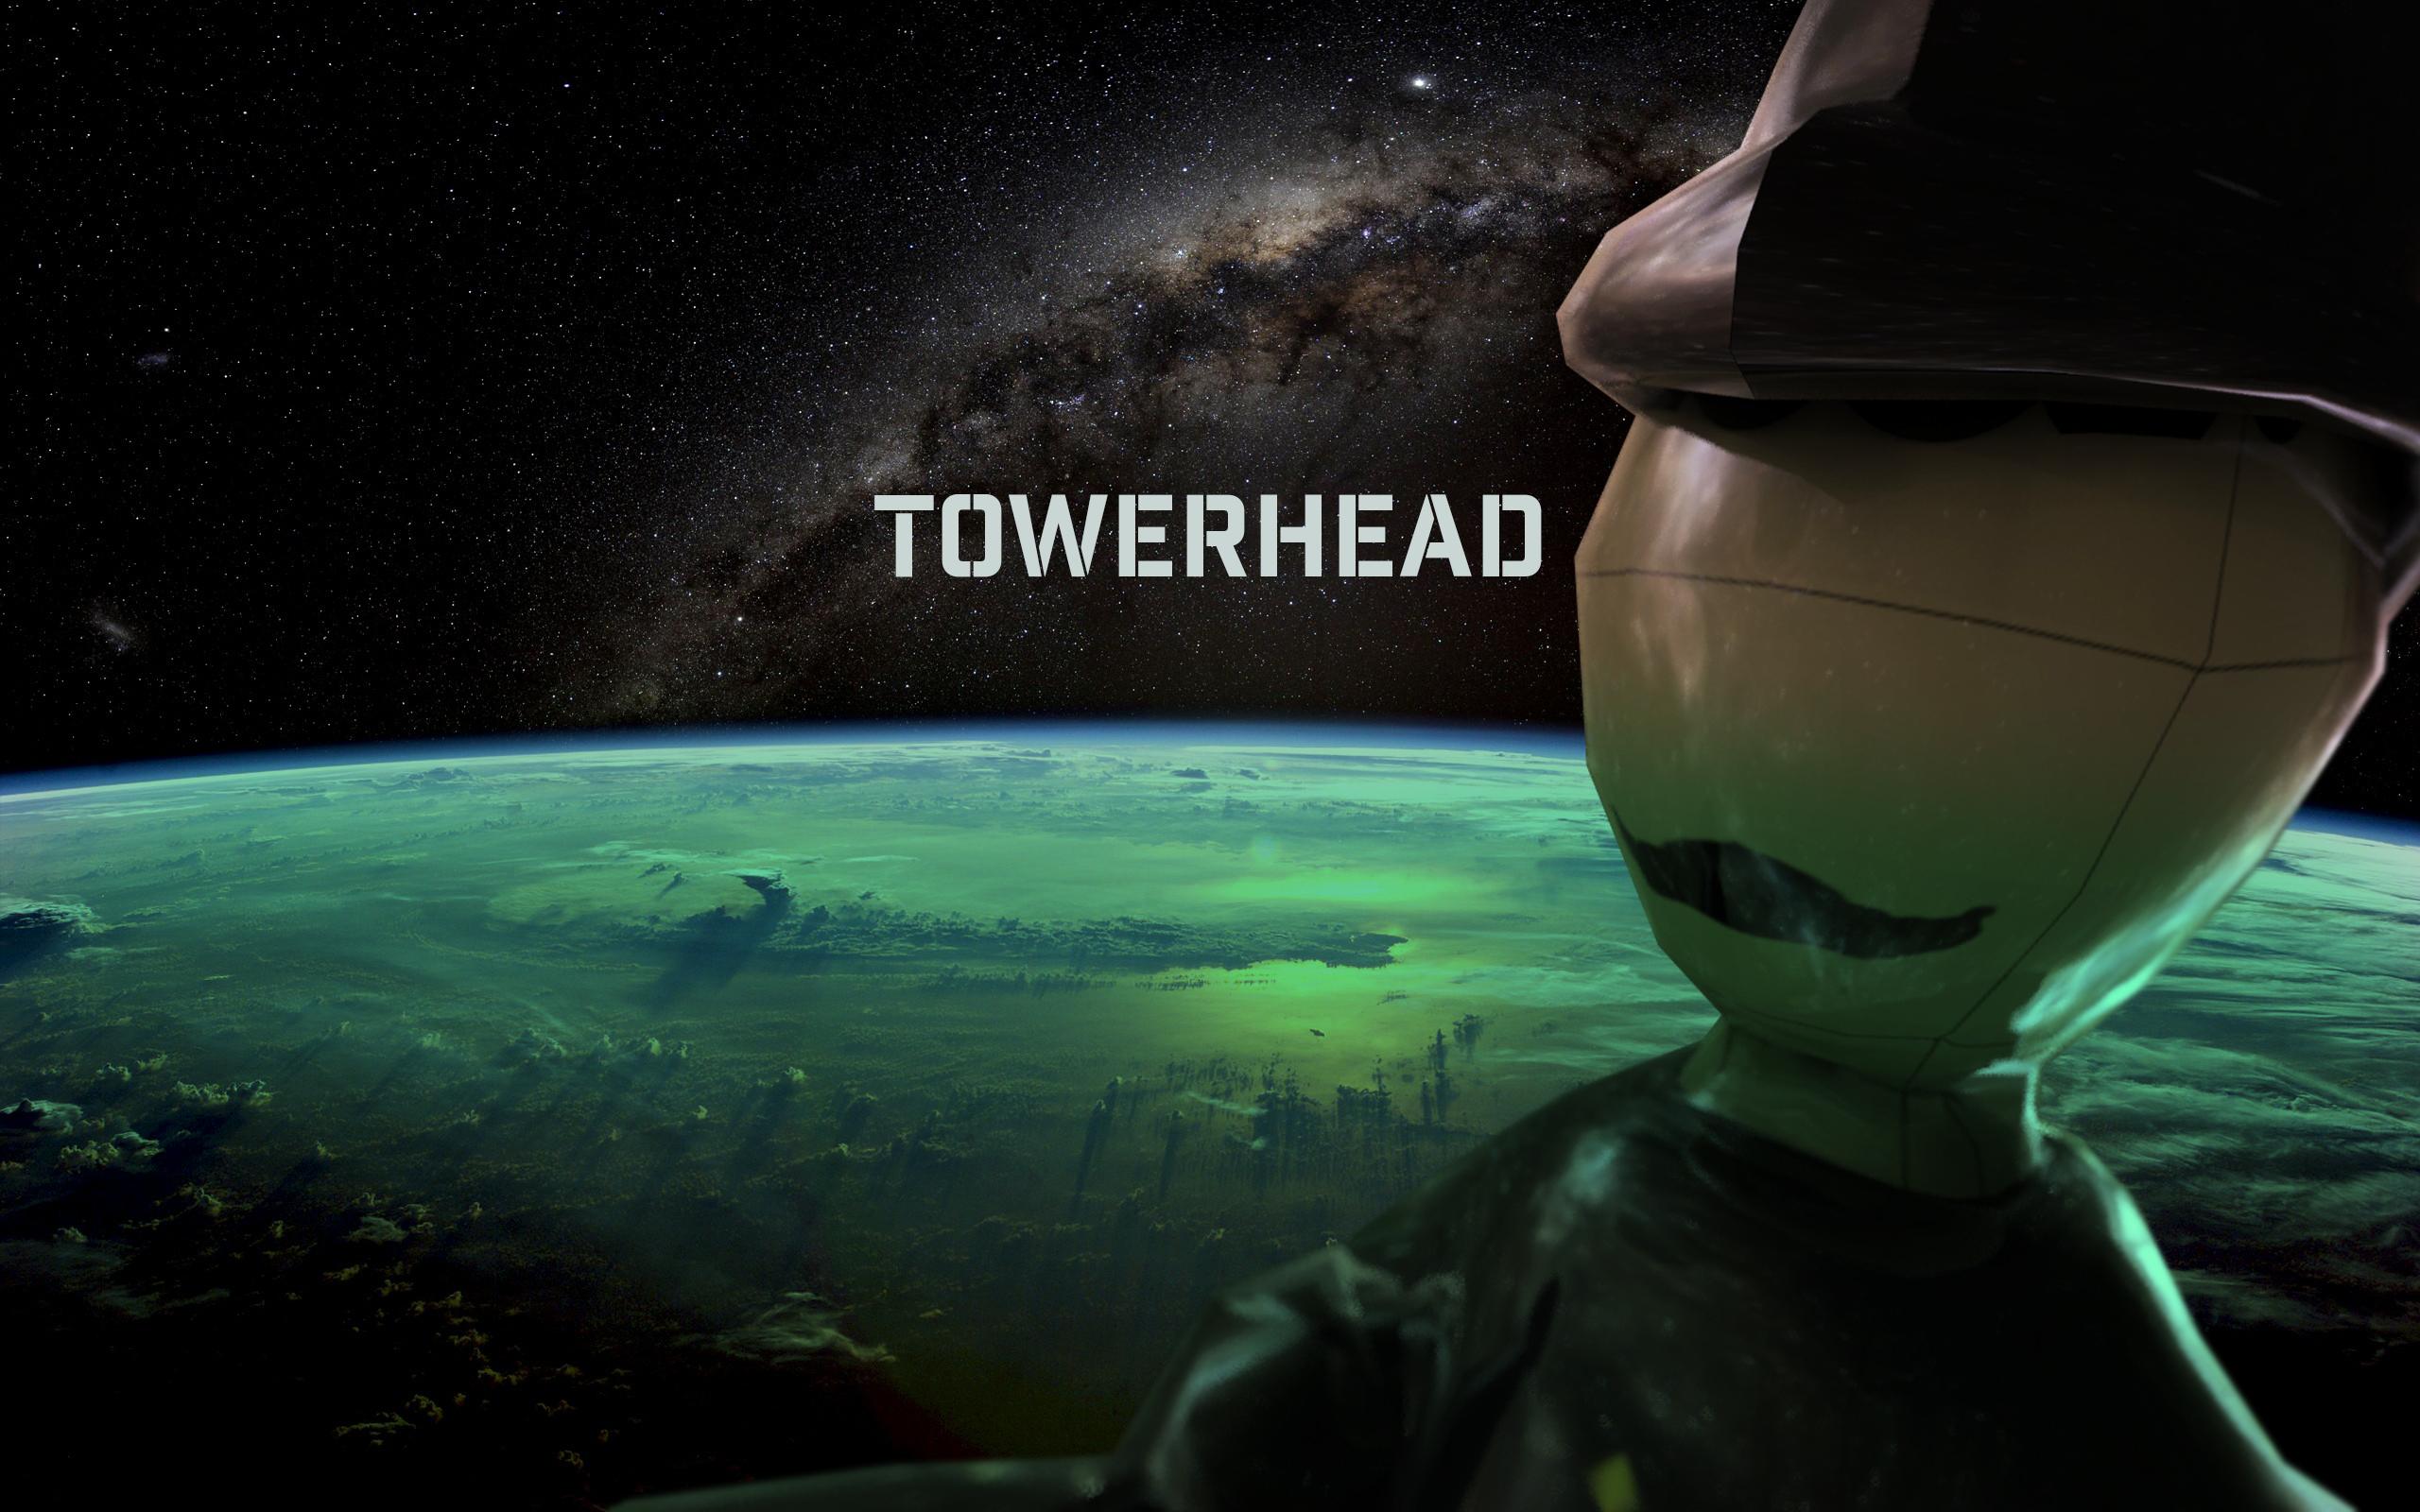 TowerHead